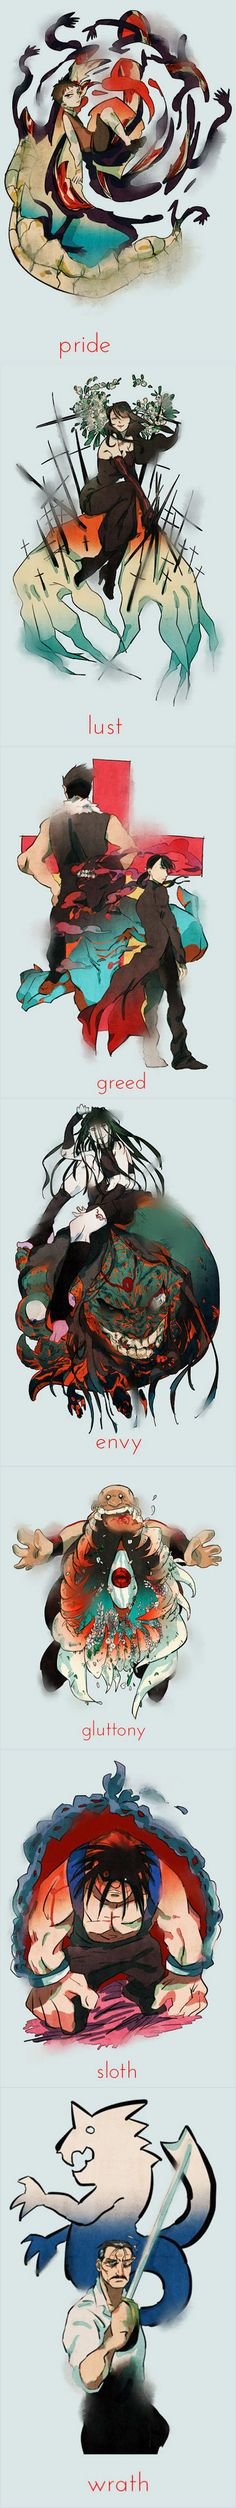 Fullmetal Alchemist - the Seven Deadly Sins - homunculi